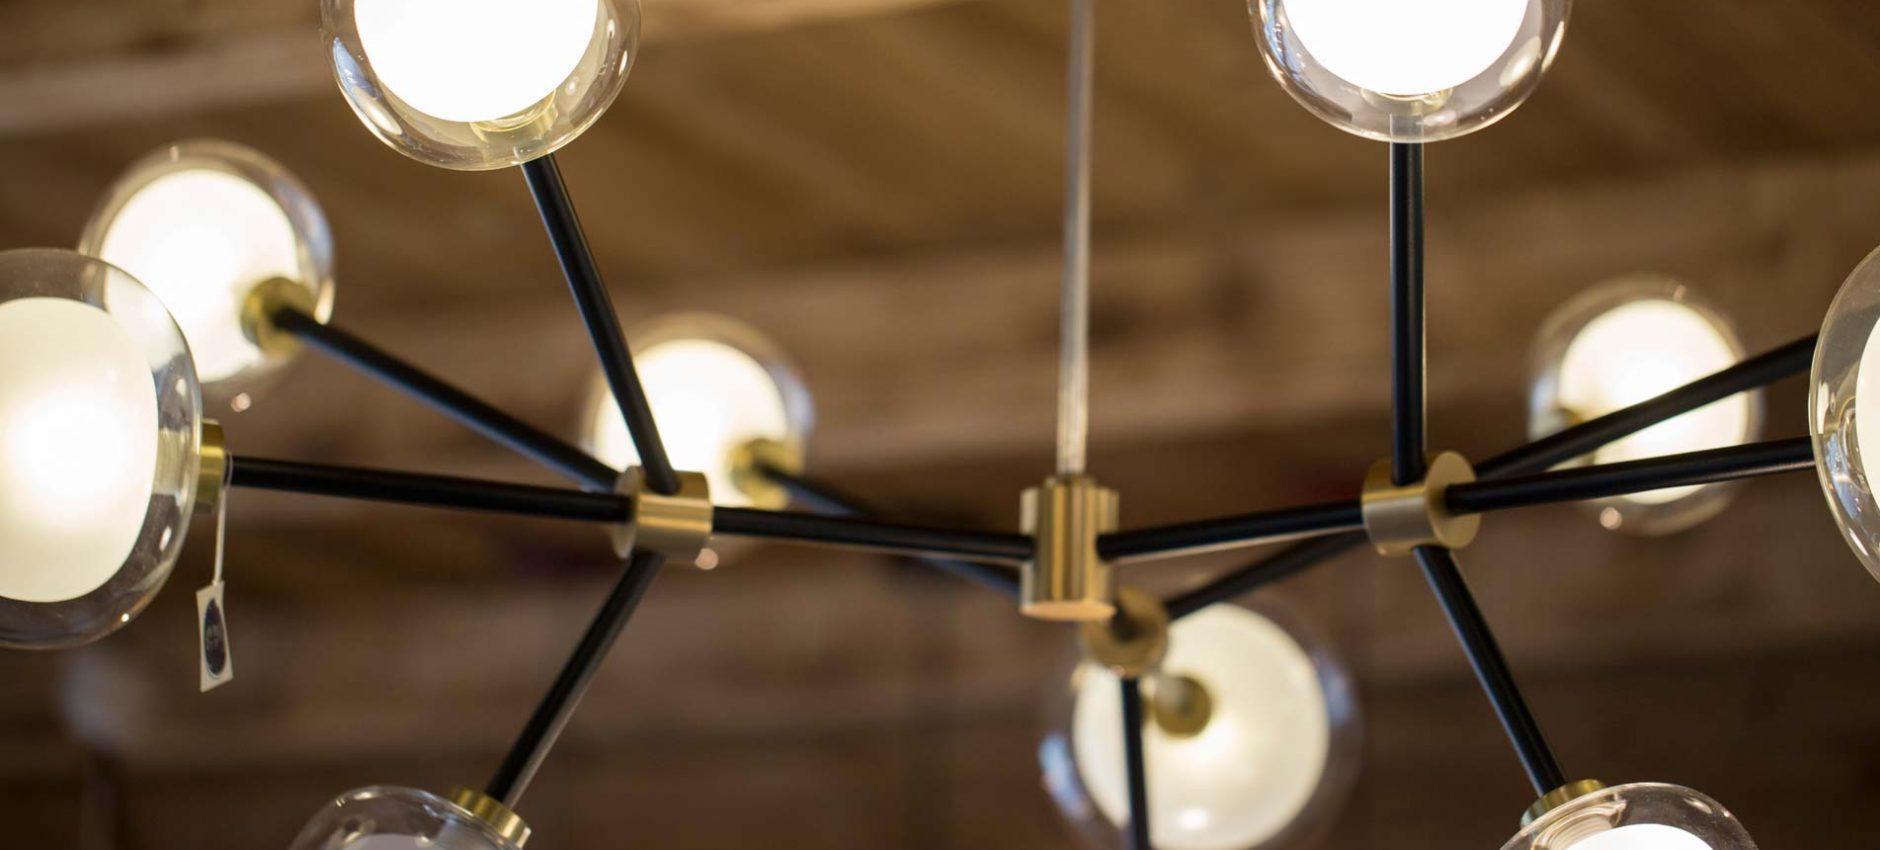 cdl-luce-vendita-lampade-soffitto.jpg